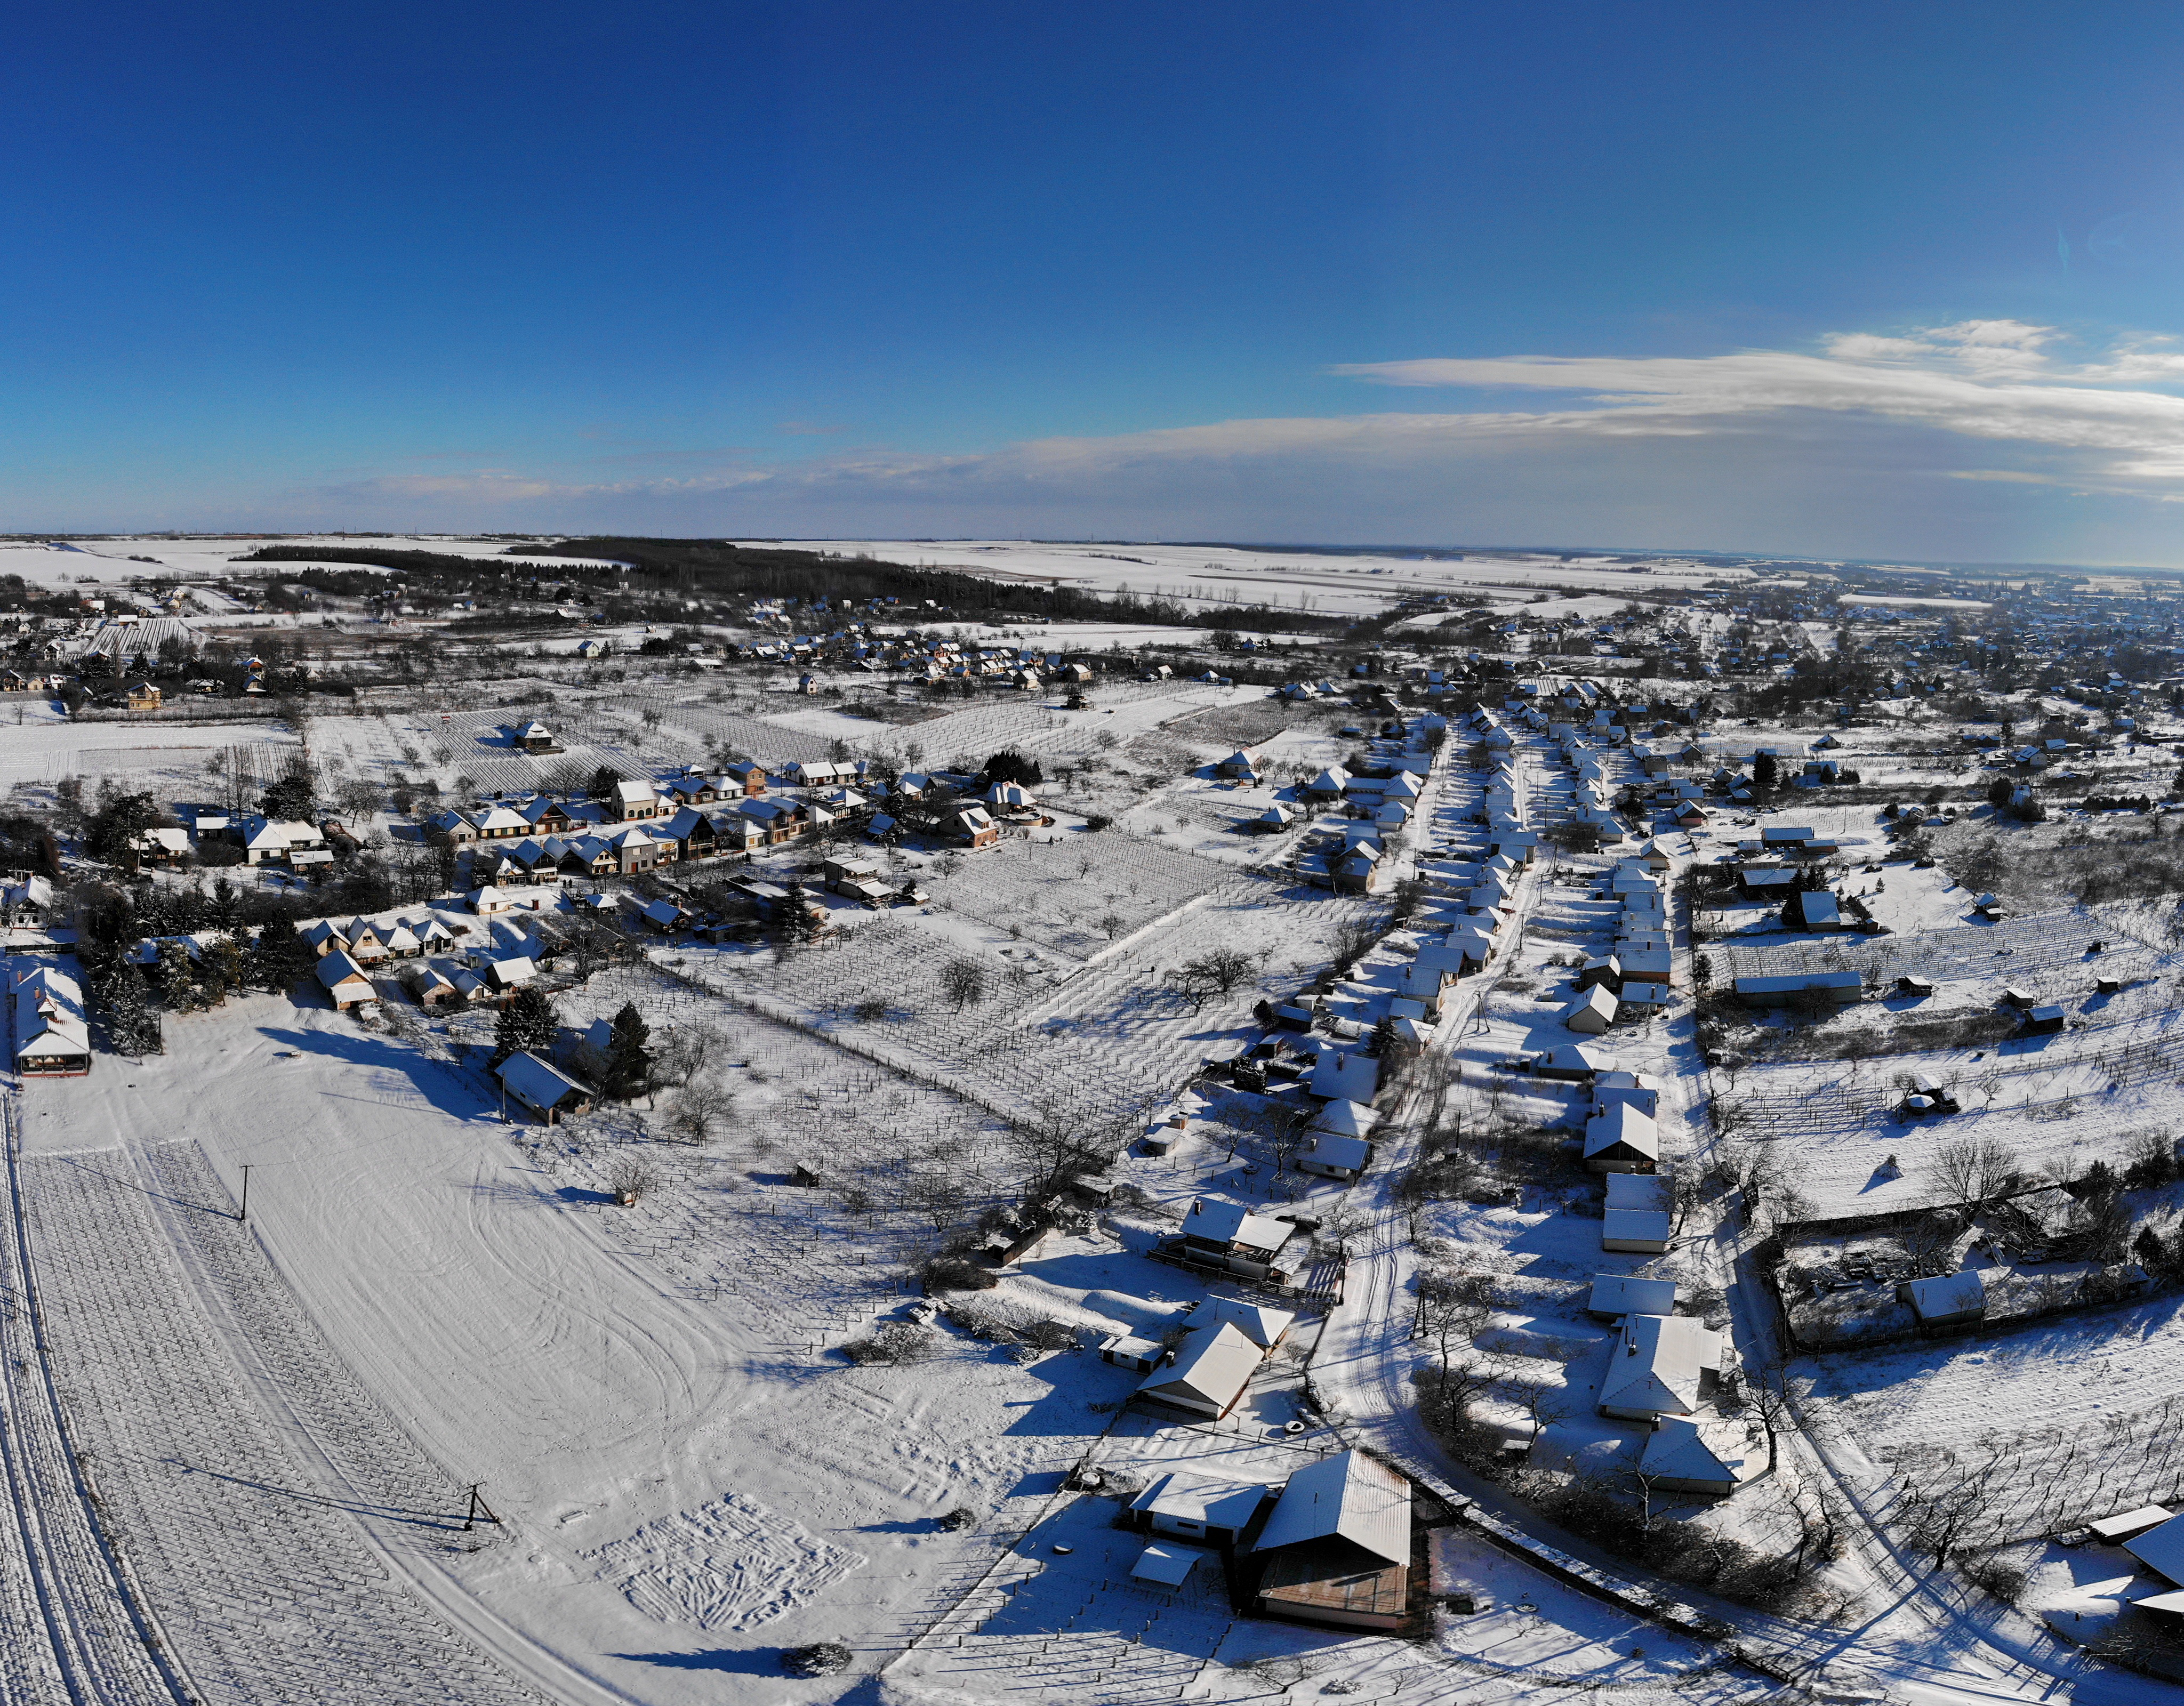 Monori Pincefalu télen, légi fotó